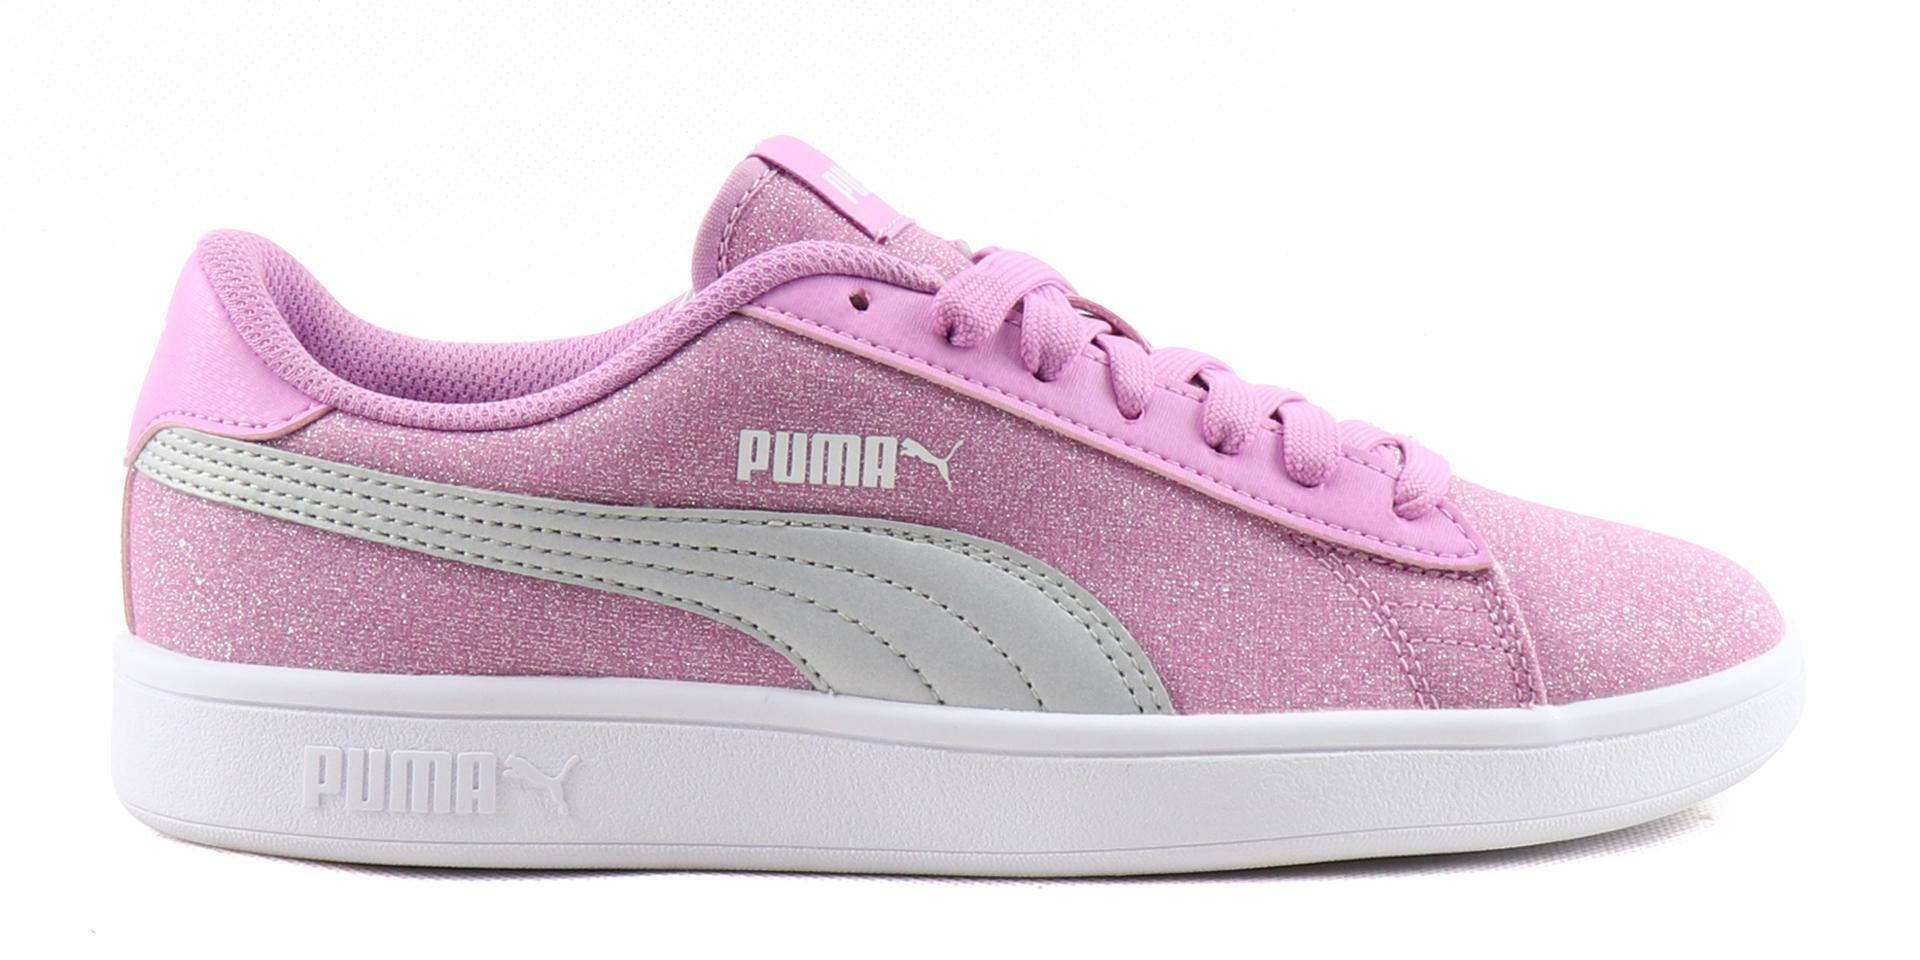 Puma smash v2 glitz glam jr bambina 367377 002 rosa